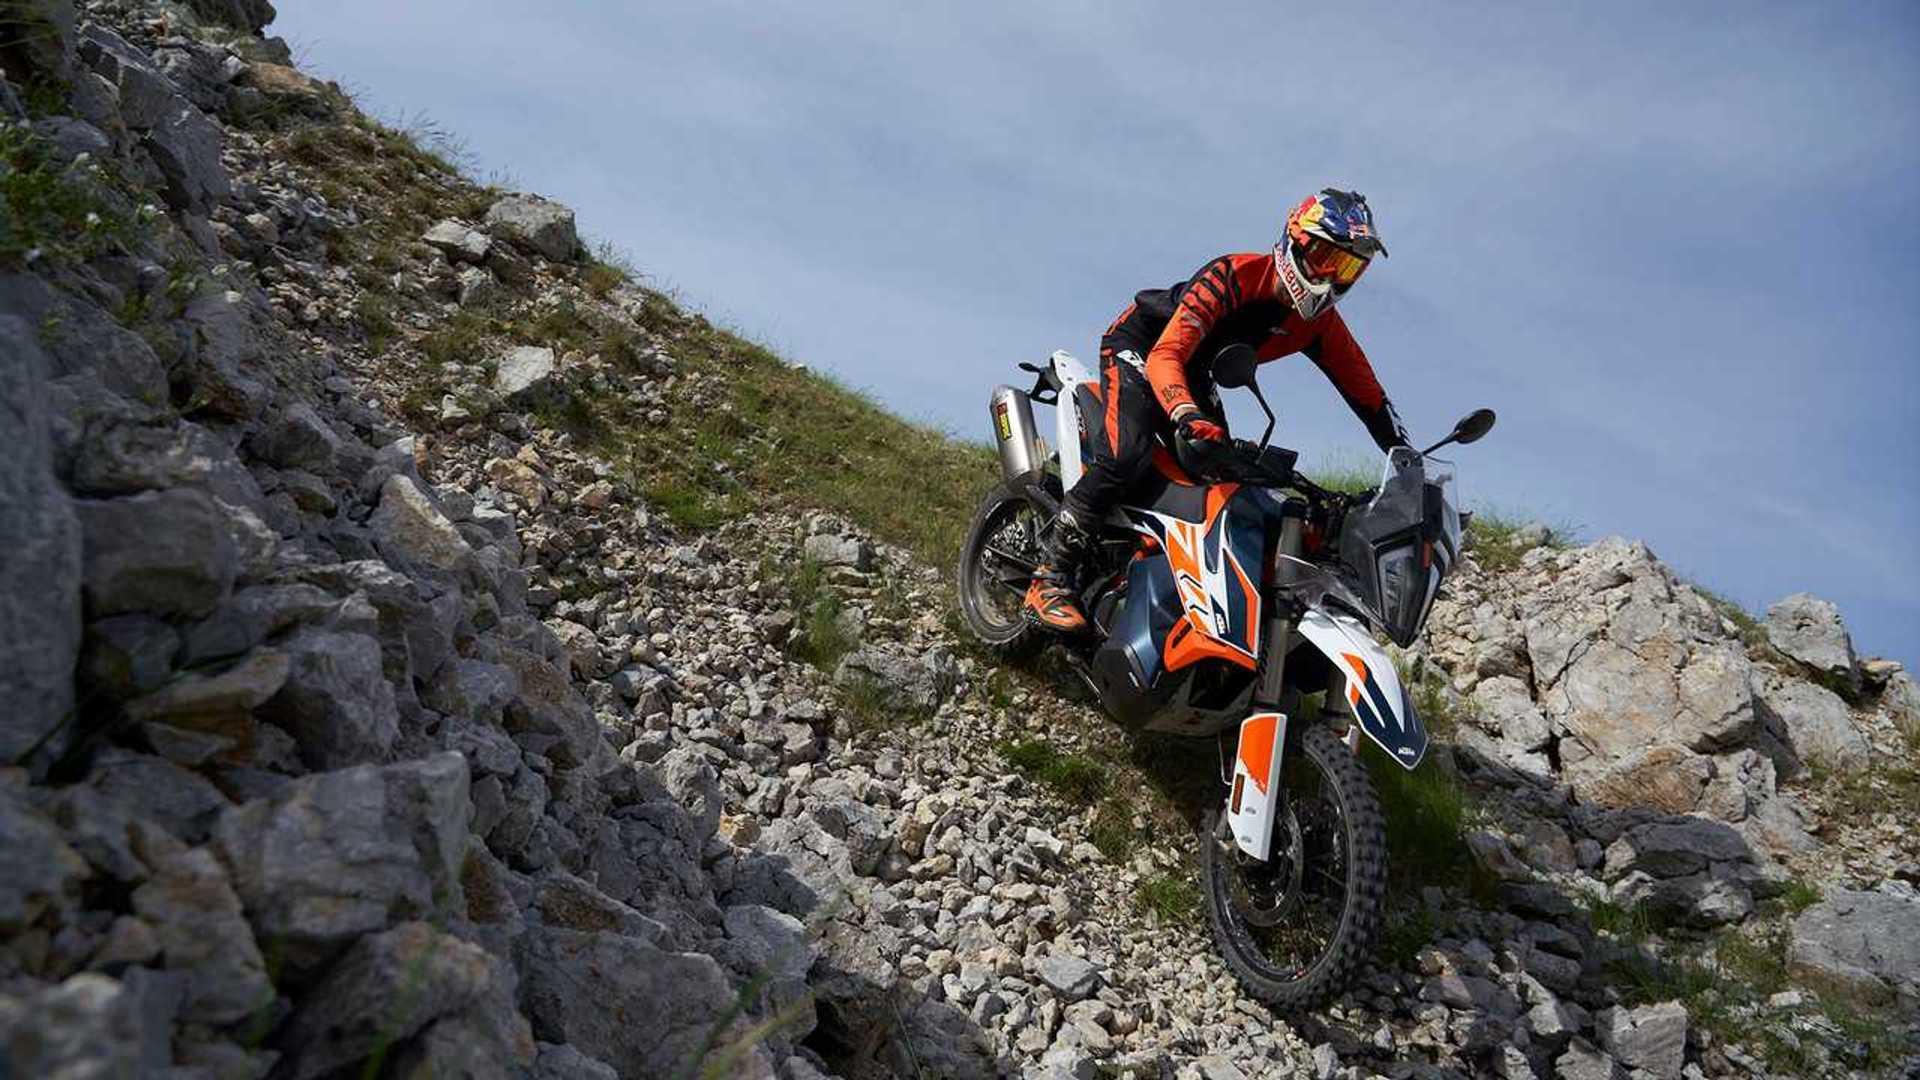 New KTM 790 Adventure R Gets Rally Treatment